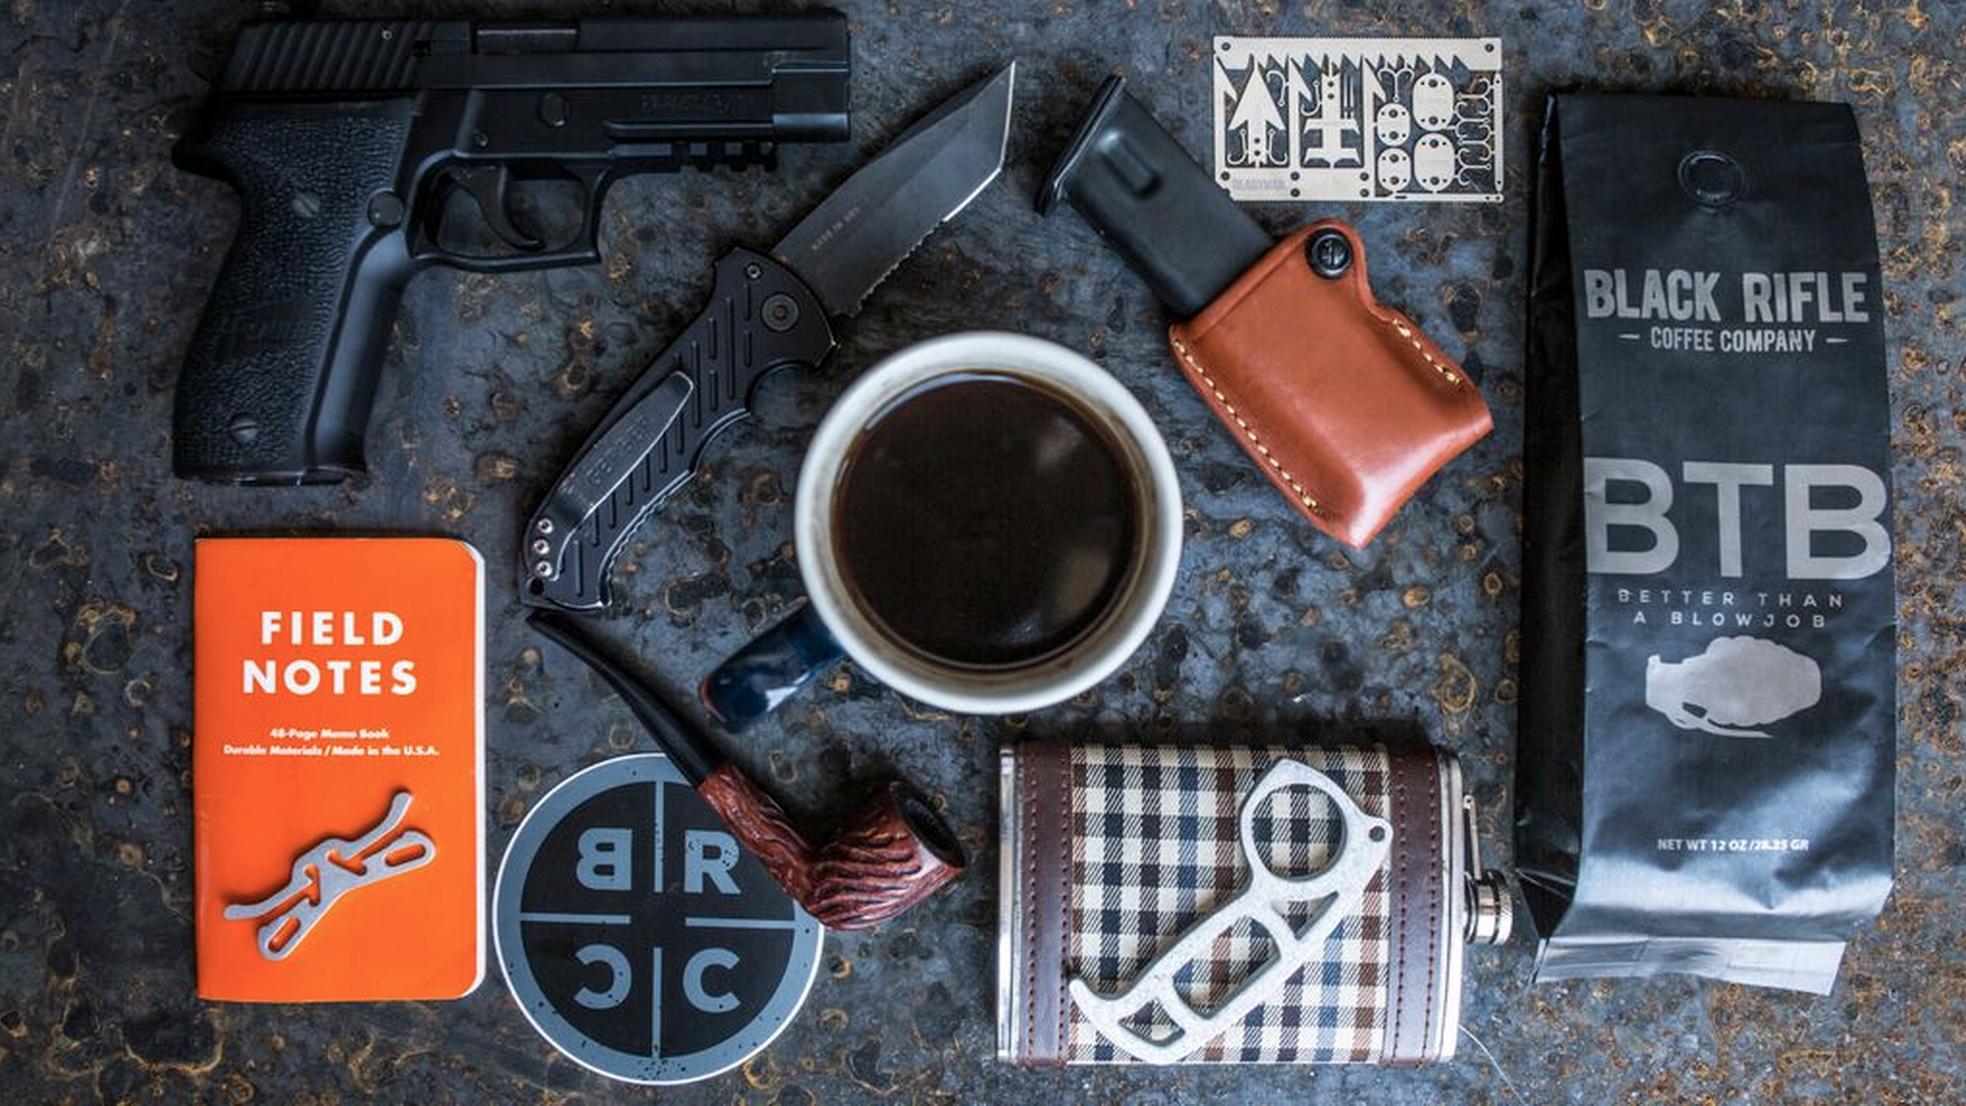 Pin on Black Rifle Coffee Company